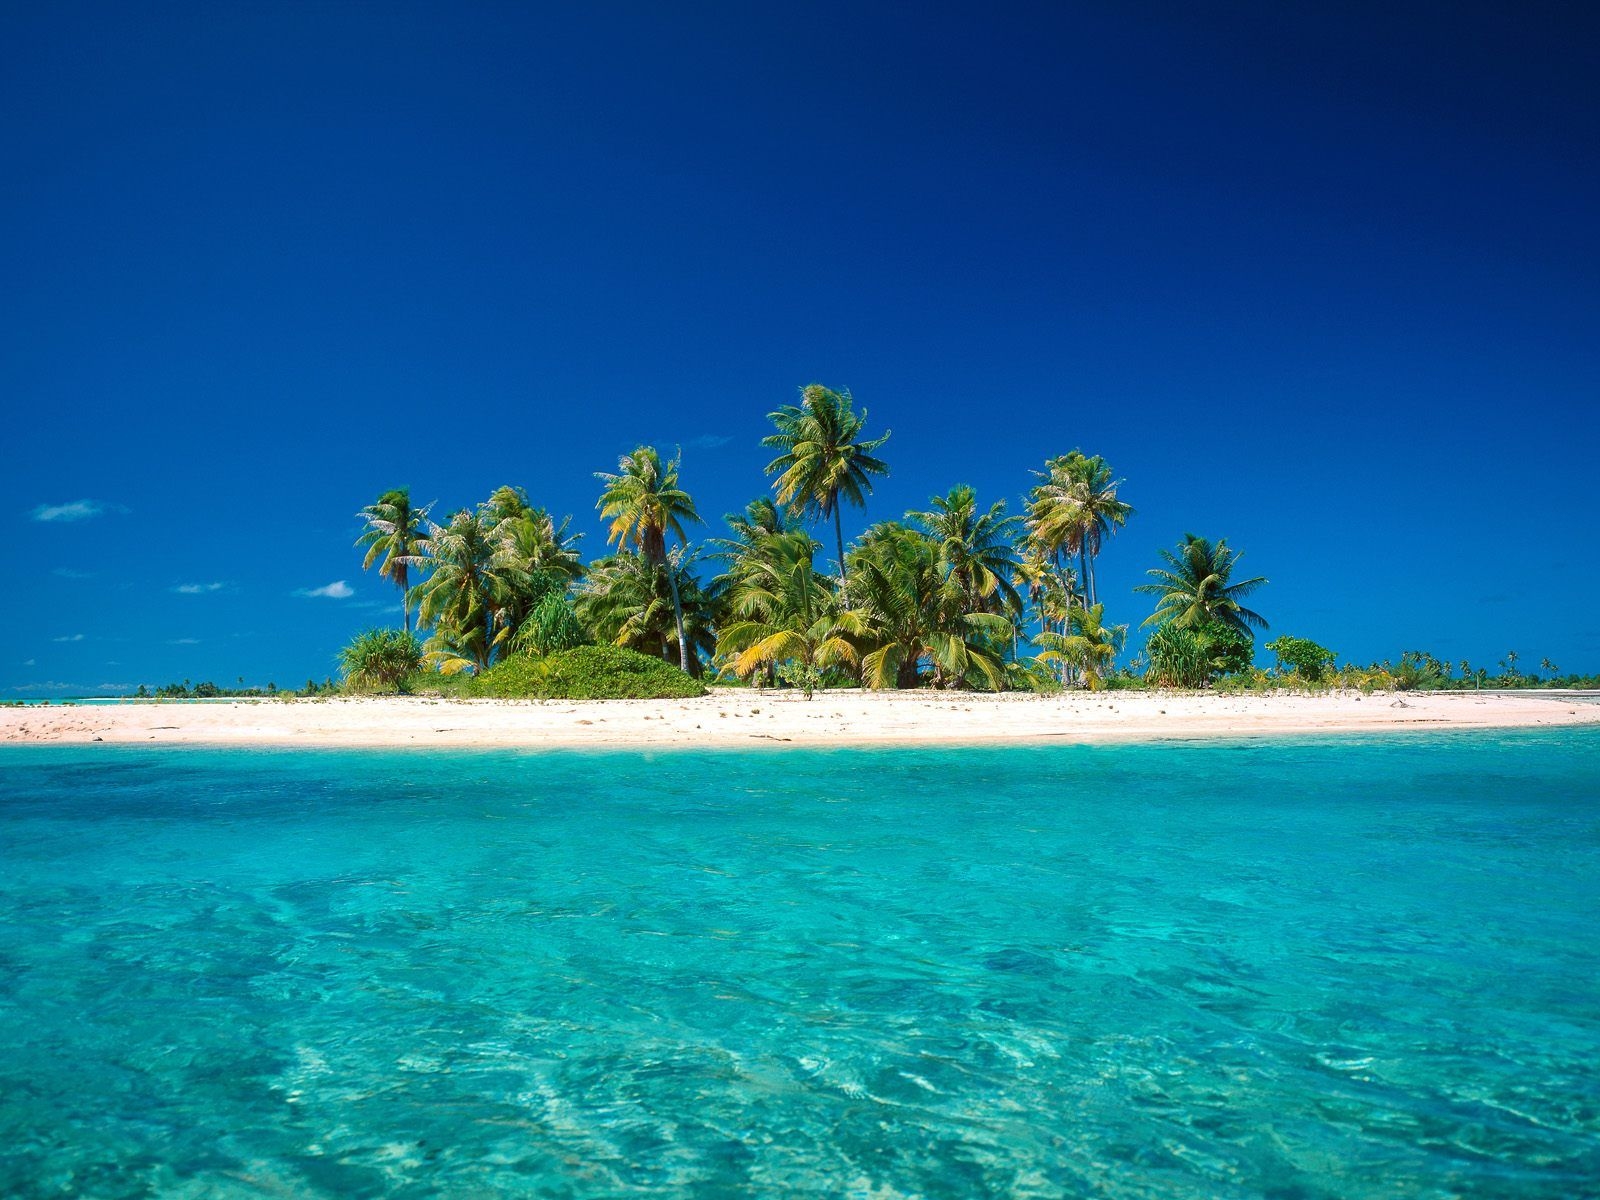 Island Getaway, Bora Bora, French Polynesia - http://imashon.com/w/island-getaway-bora-bora-french-polynesia.html